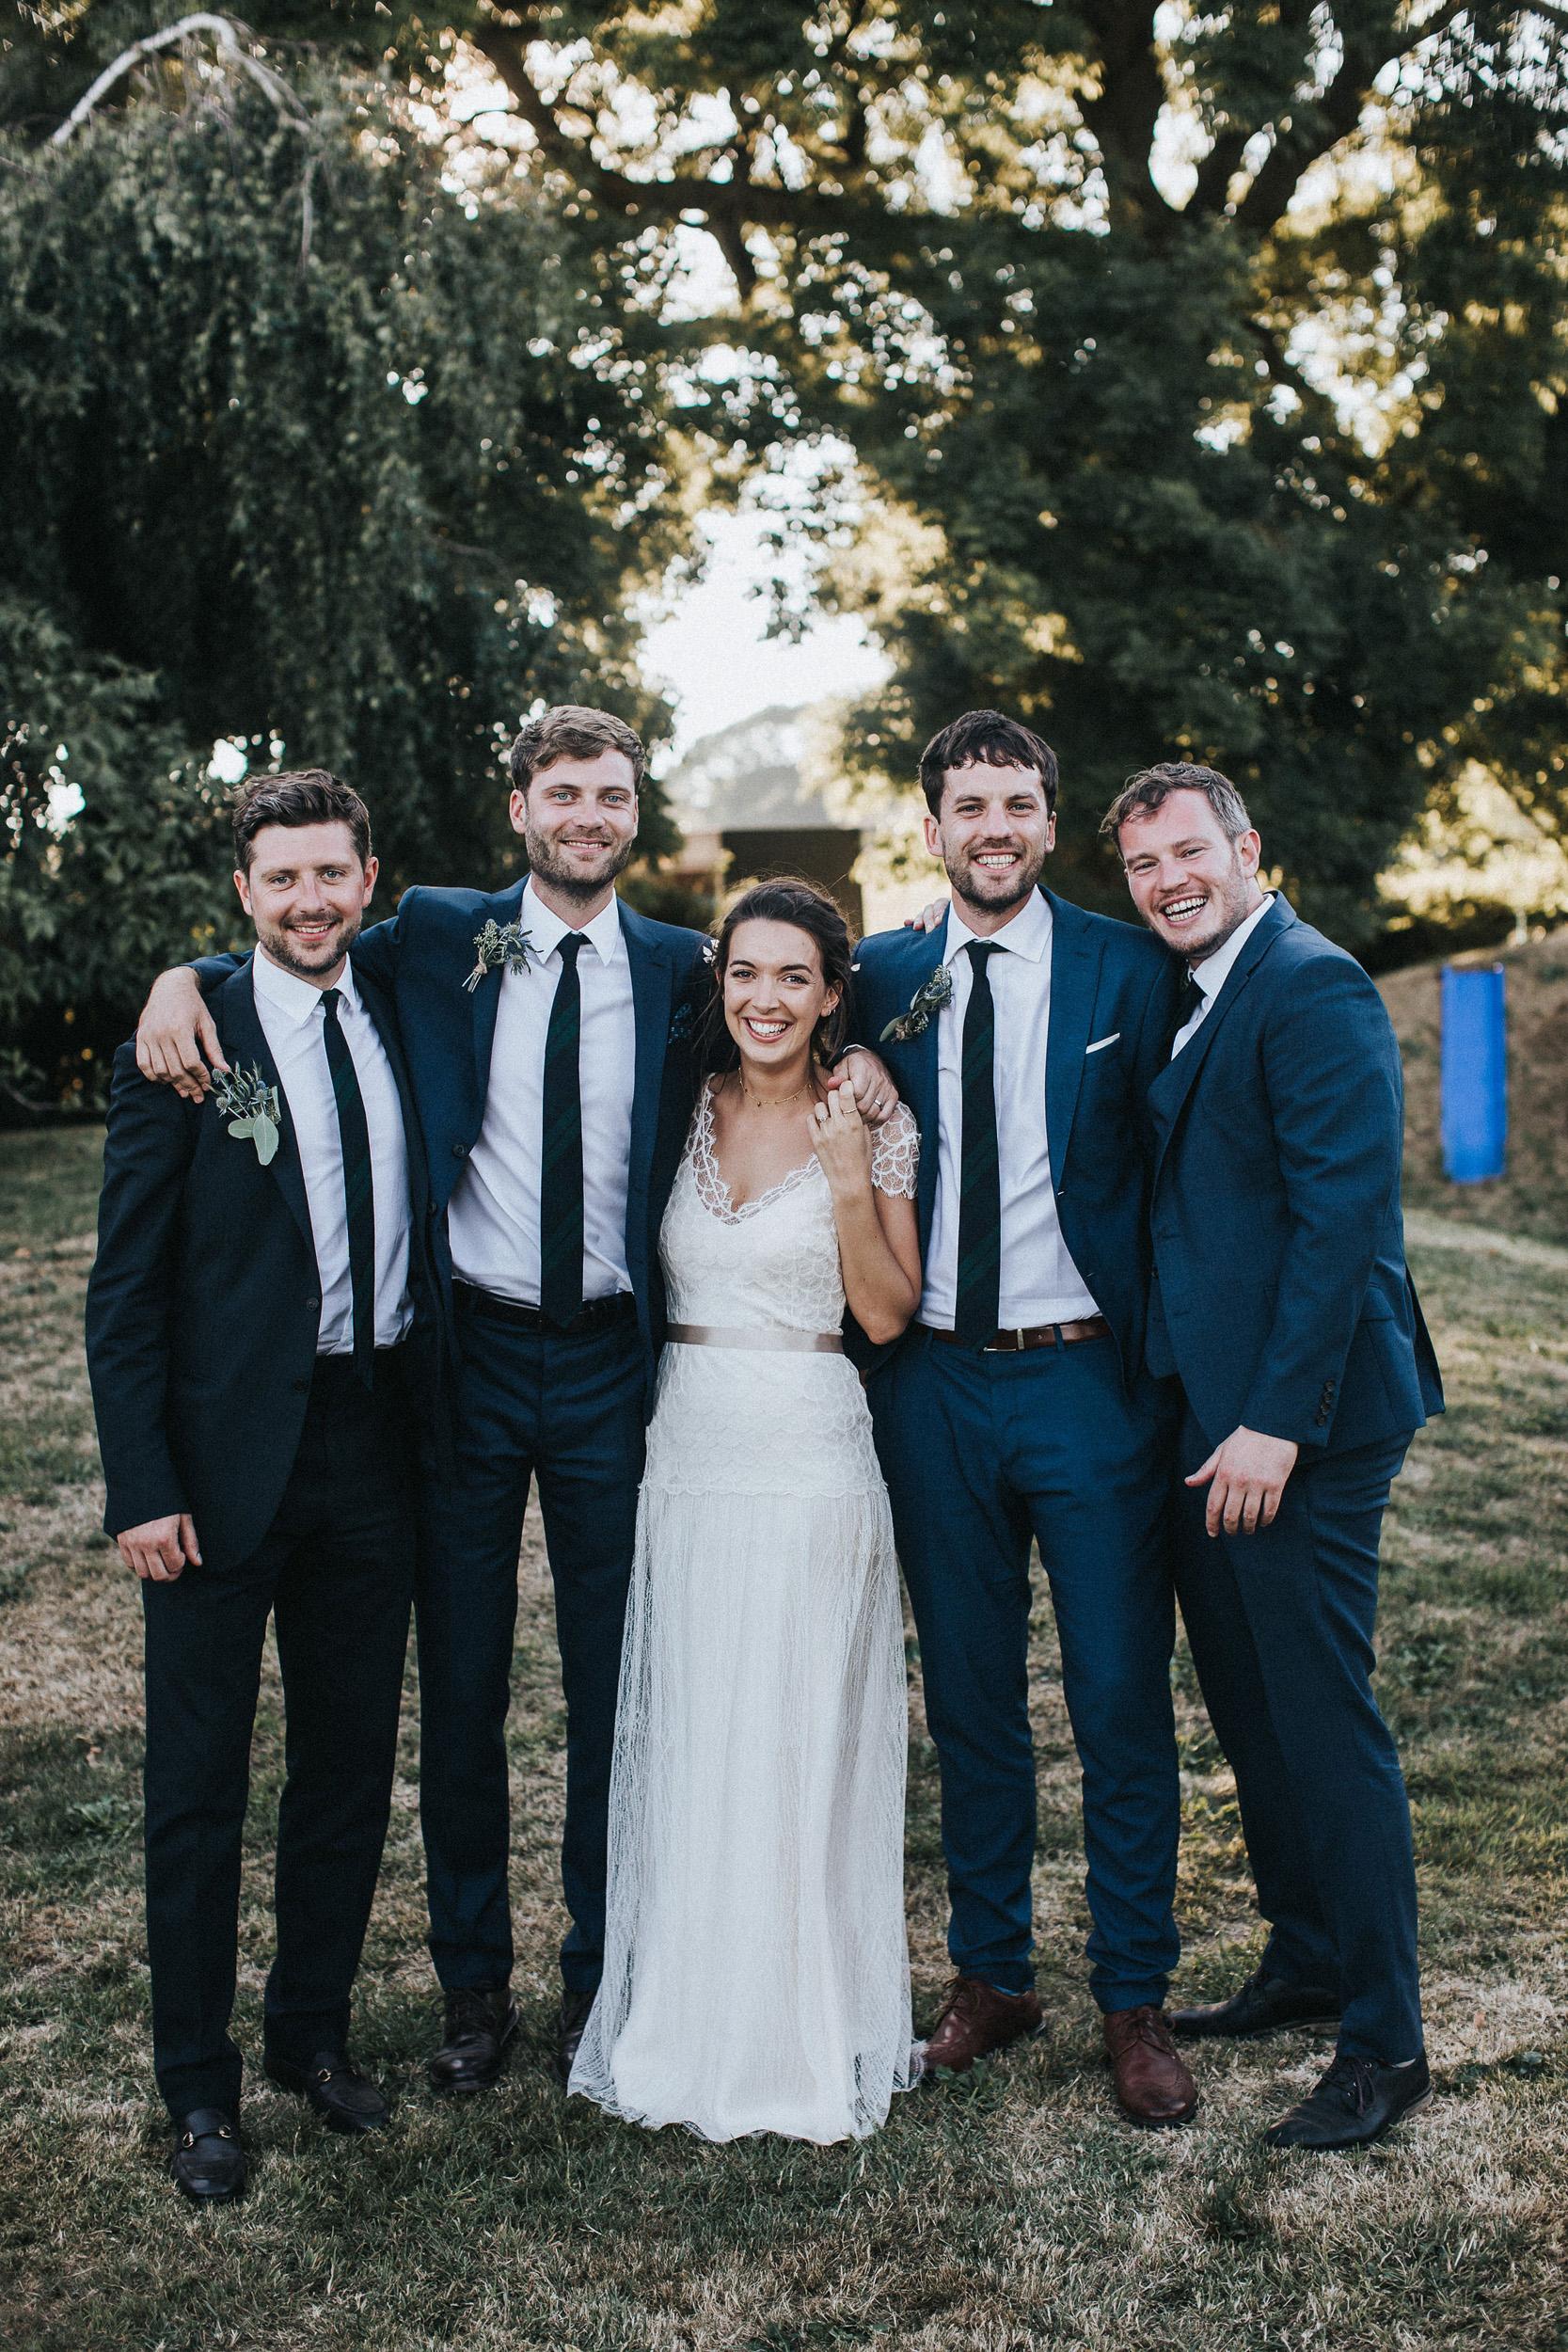 Martha-Laid-Back-Garden-Wedding-Lace-Wedding-Dress-Bohemian-Kate-Beaumont-43.jpg